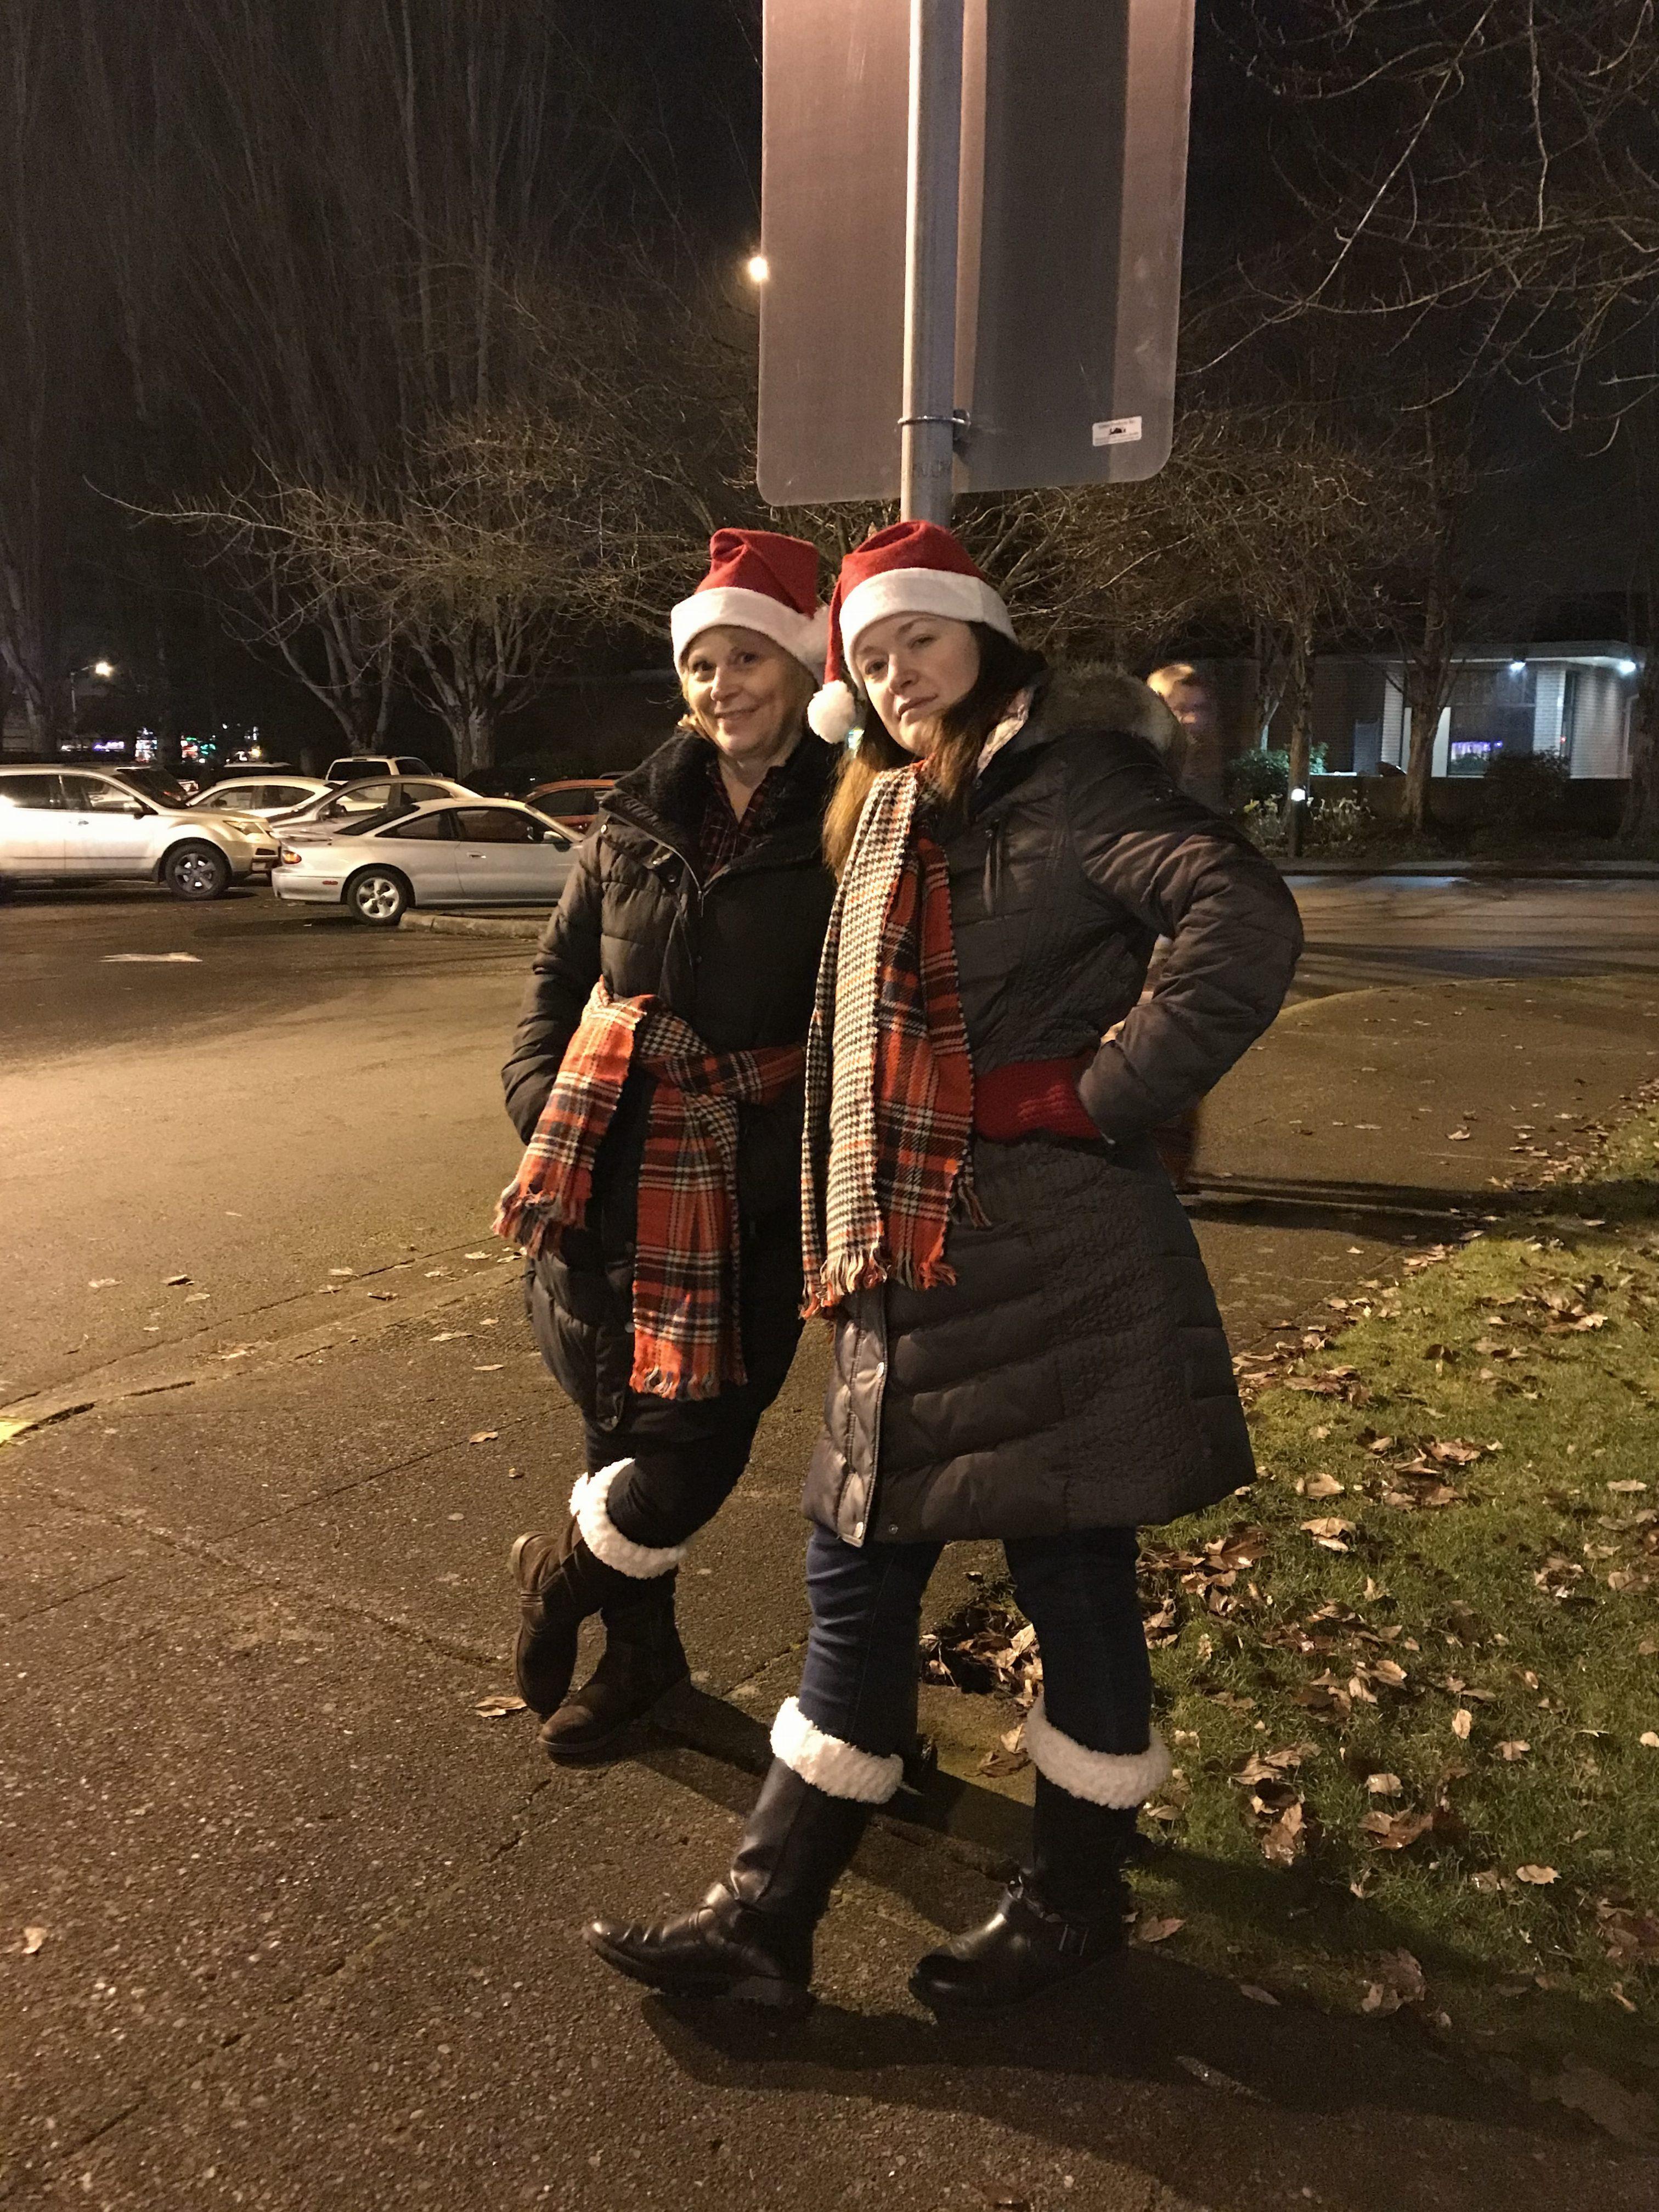 Two ladies in warm coats standing on sidewalk